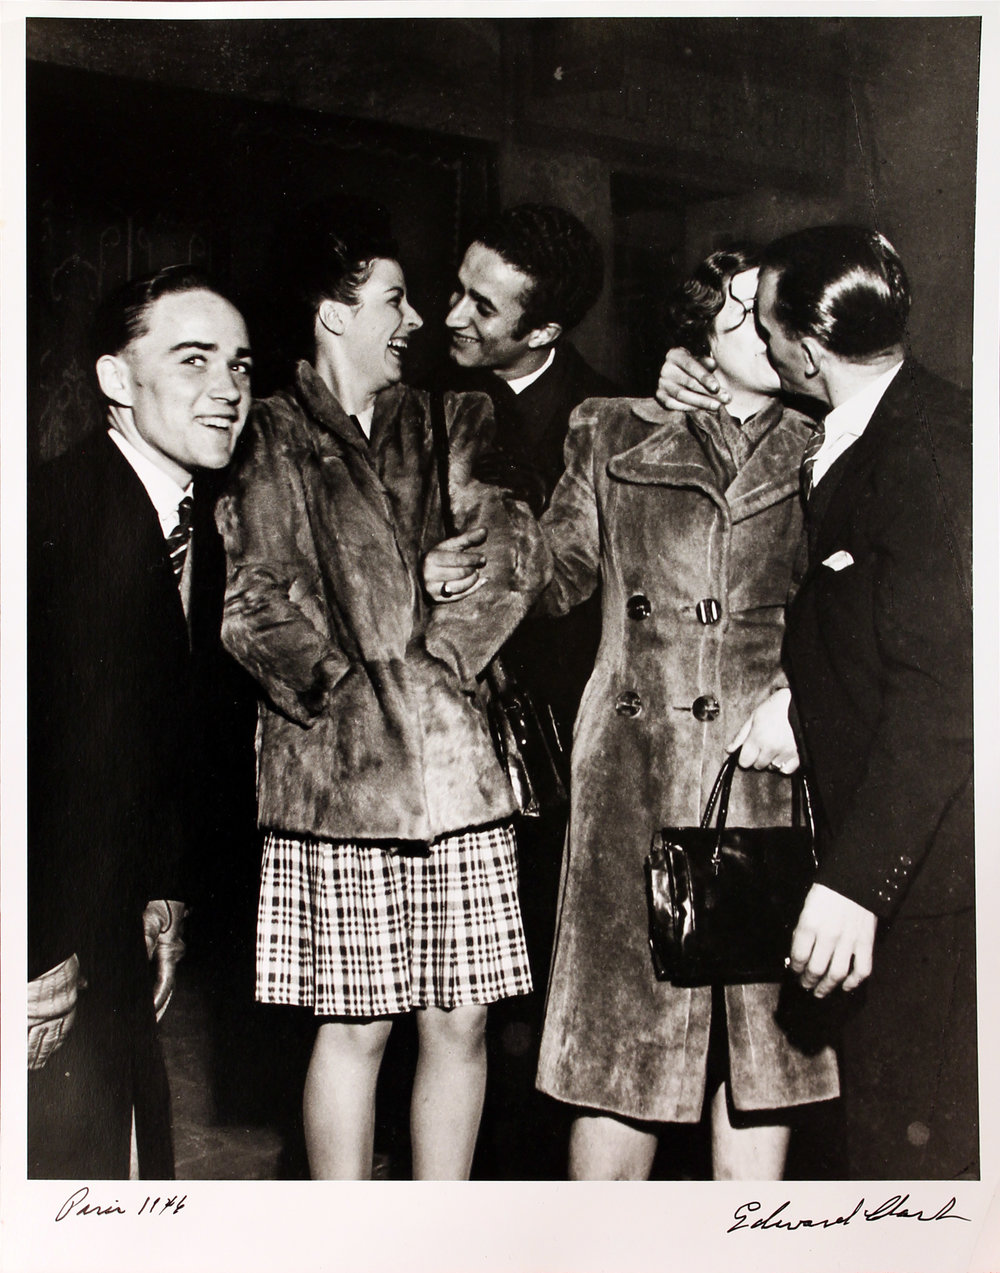 Kissing in Fur Coats, Ed Clark